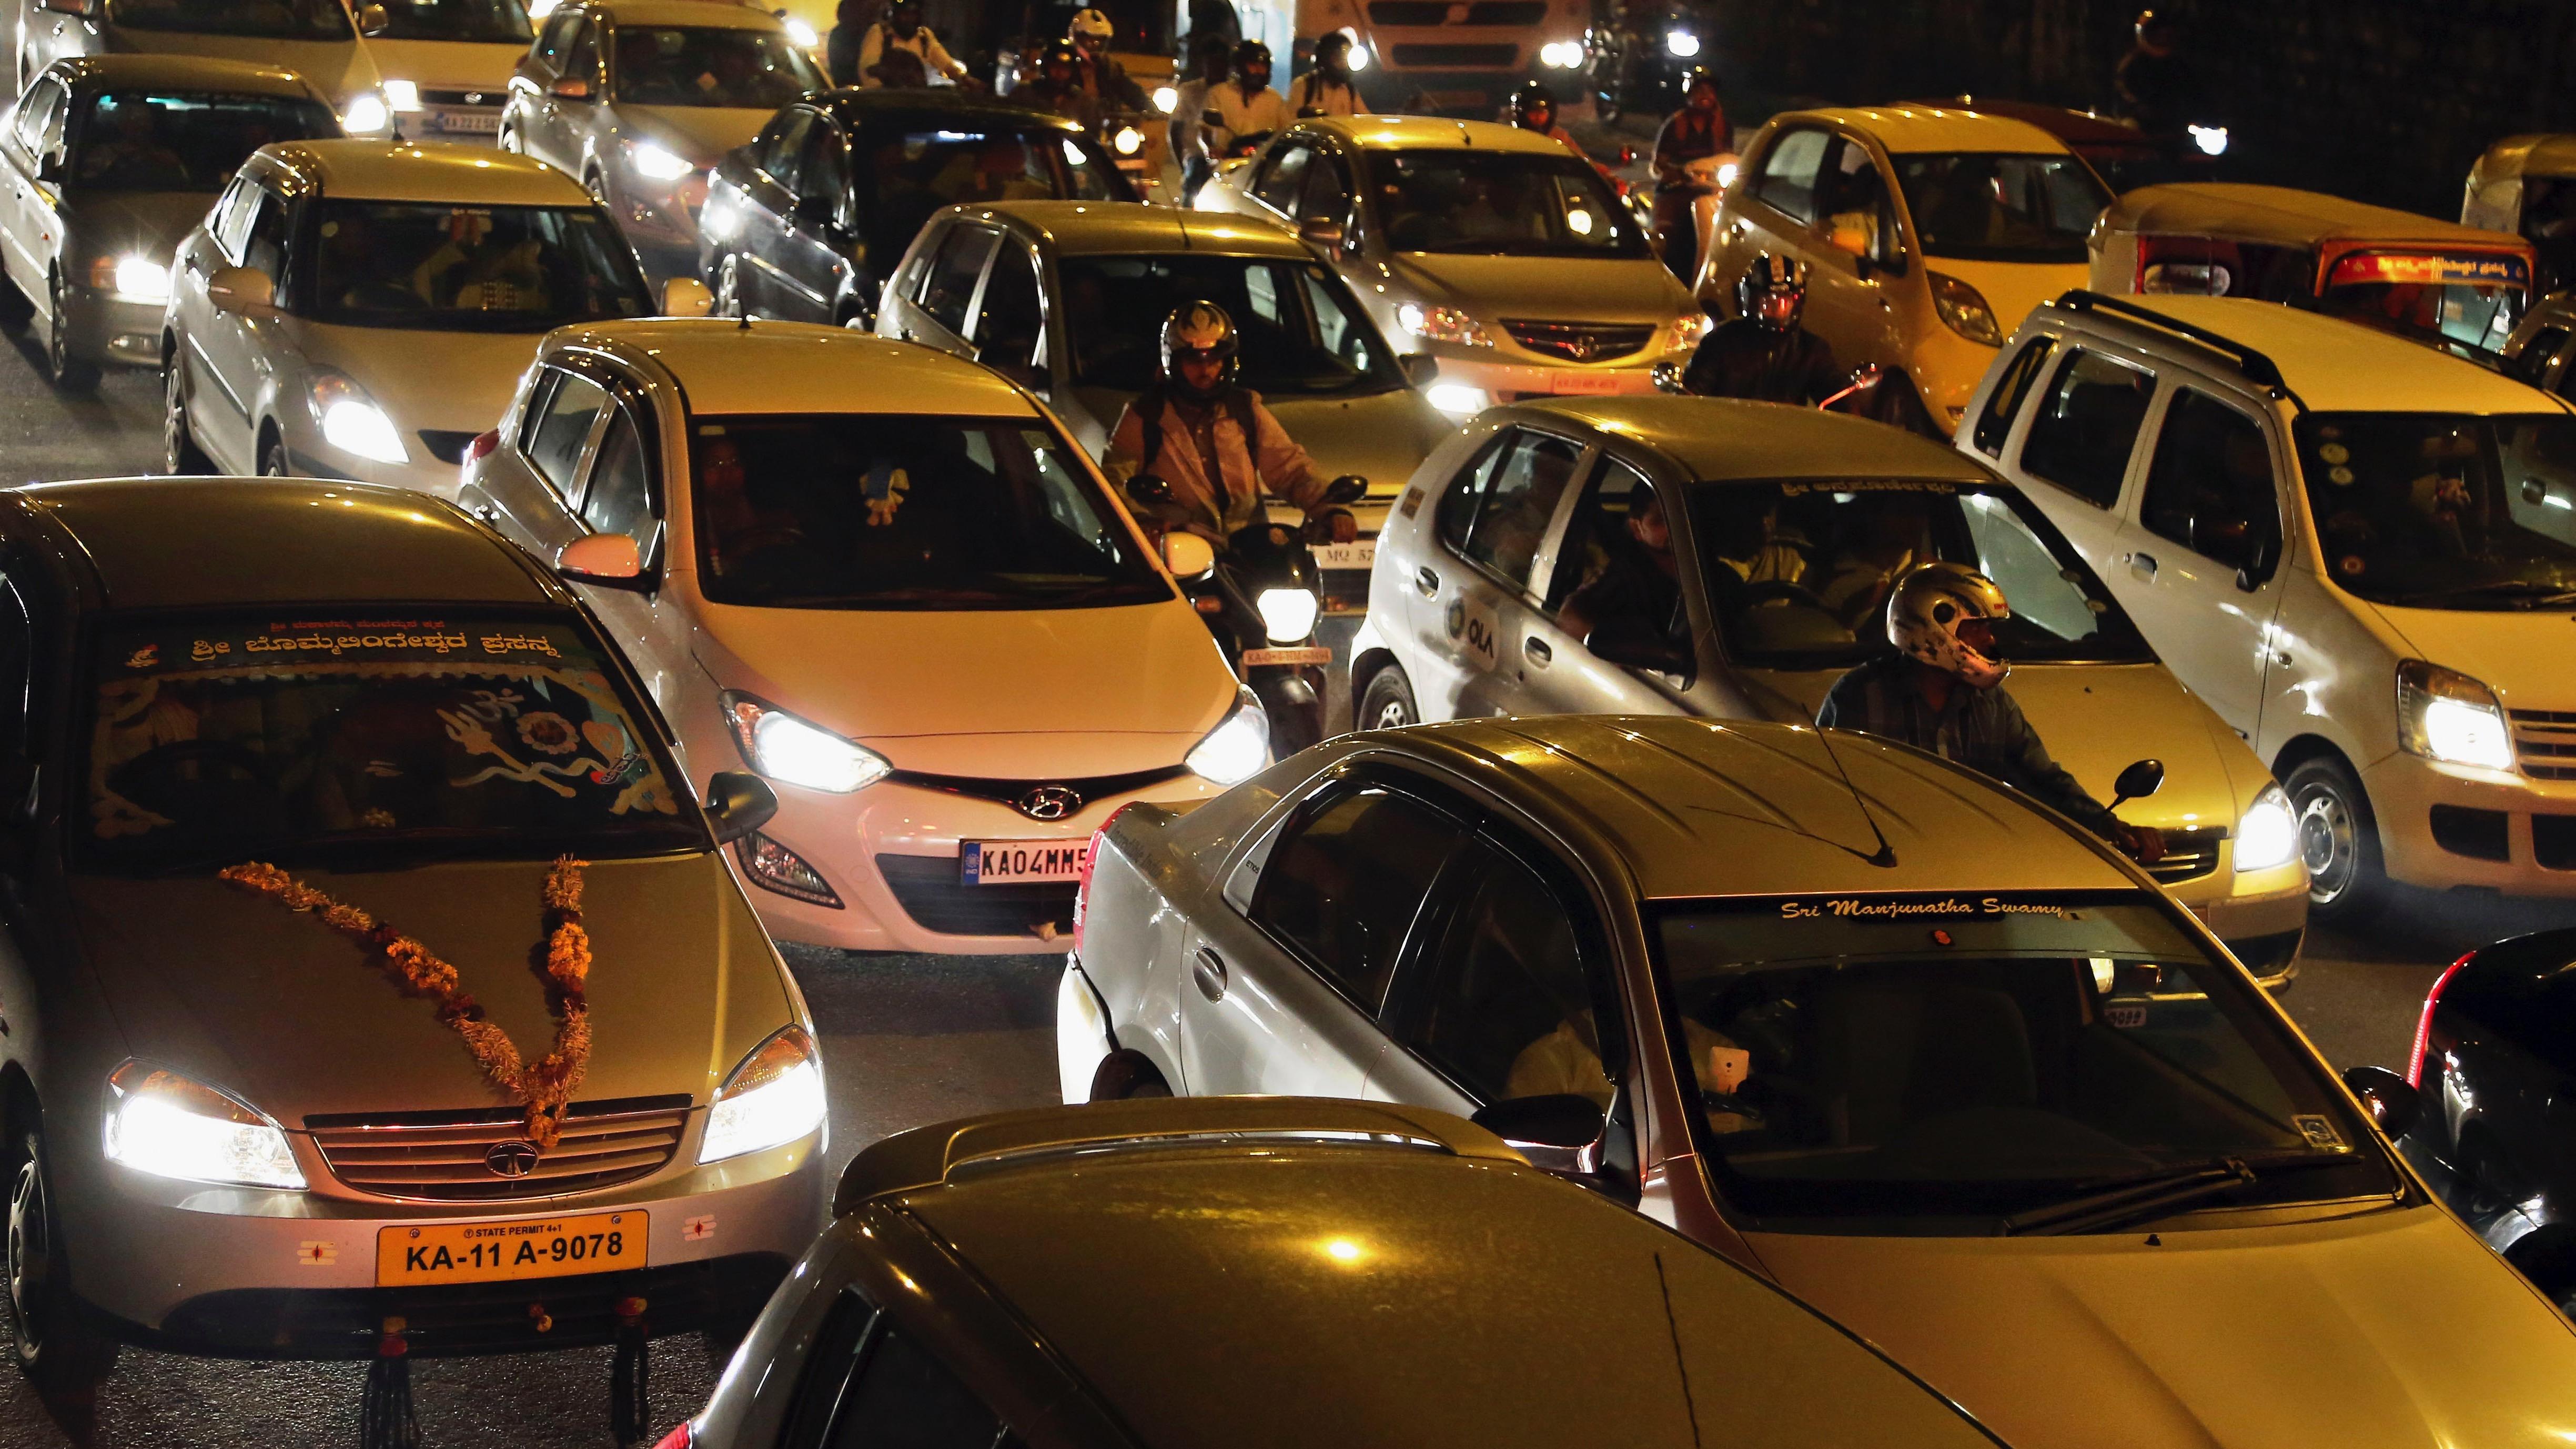 Choking Bengaluru: Karnataka could use archaic laws to ban the best